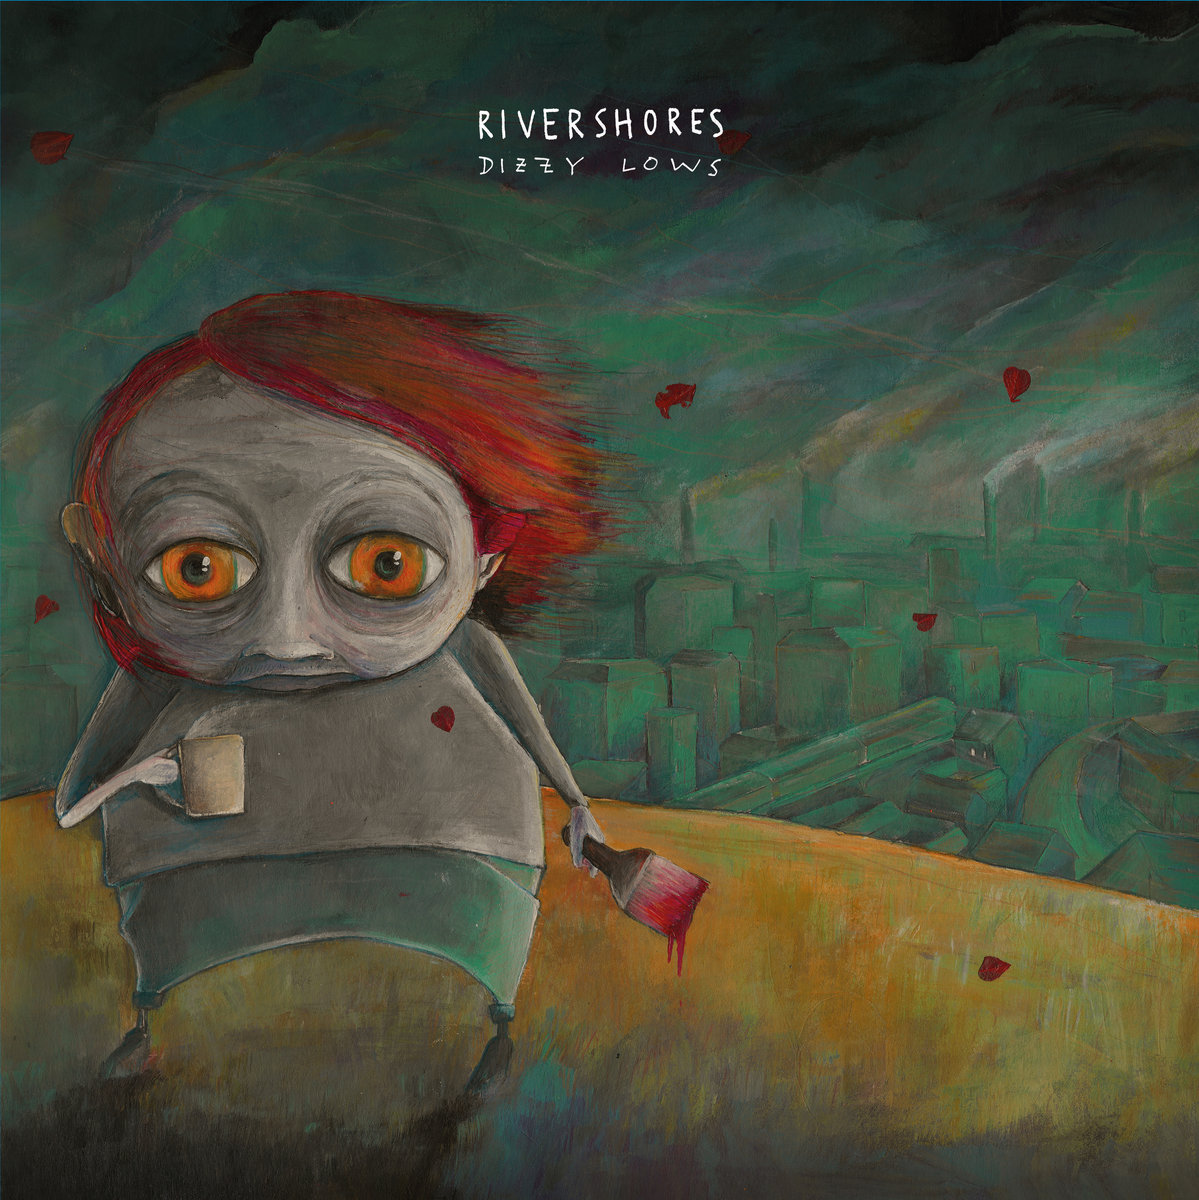 Rivershores - Dizzy Lows